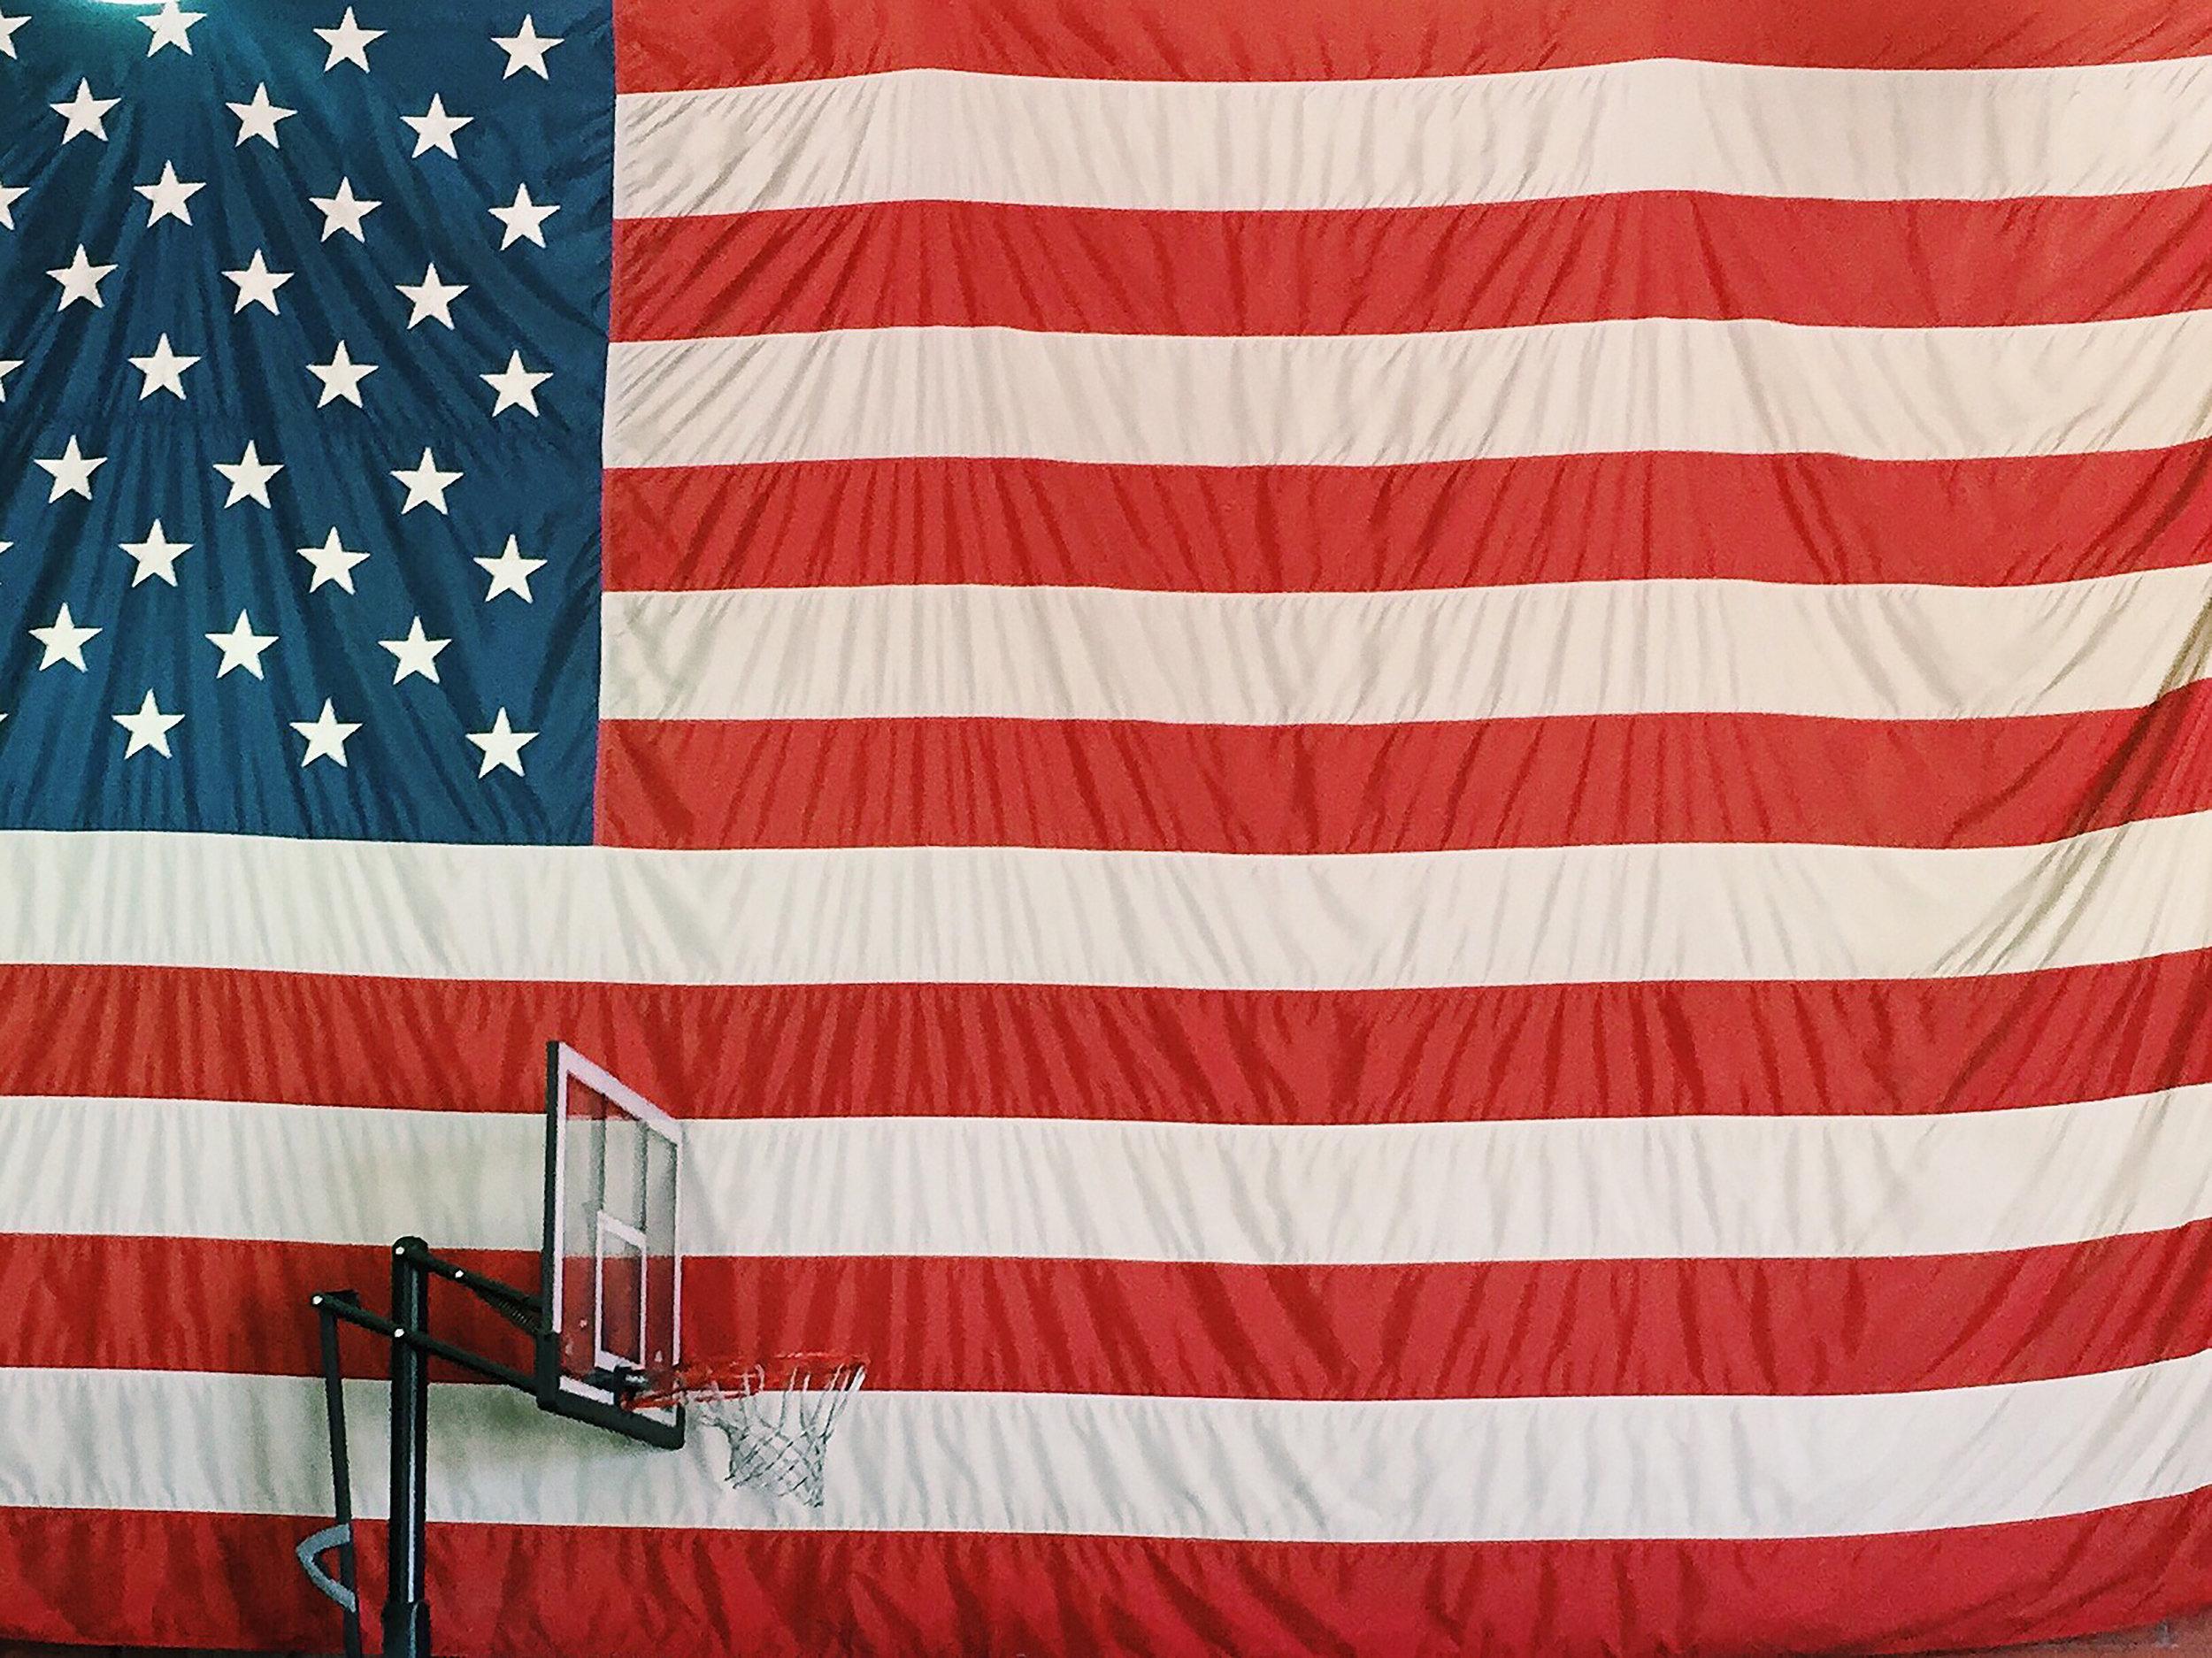 USA_FLAG_5.3x7 copy.jpg